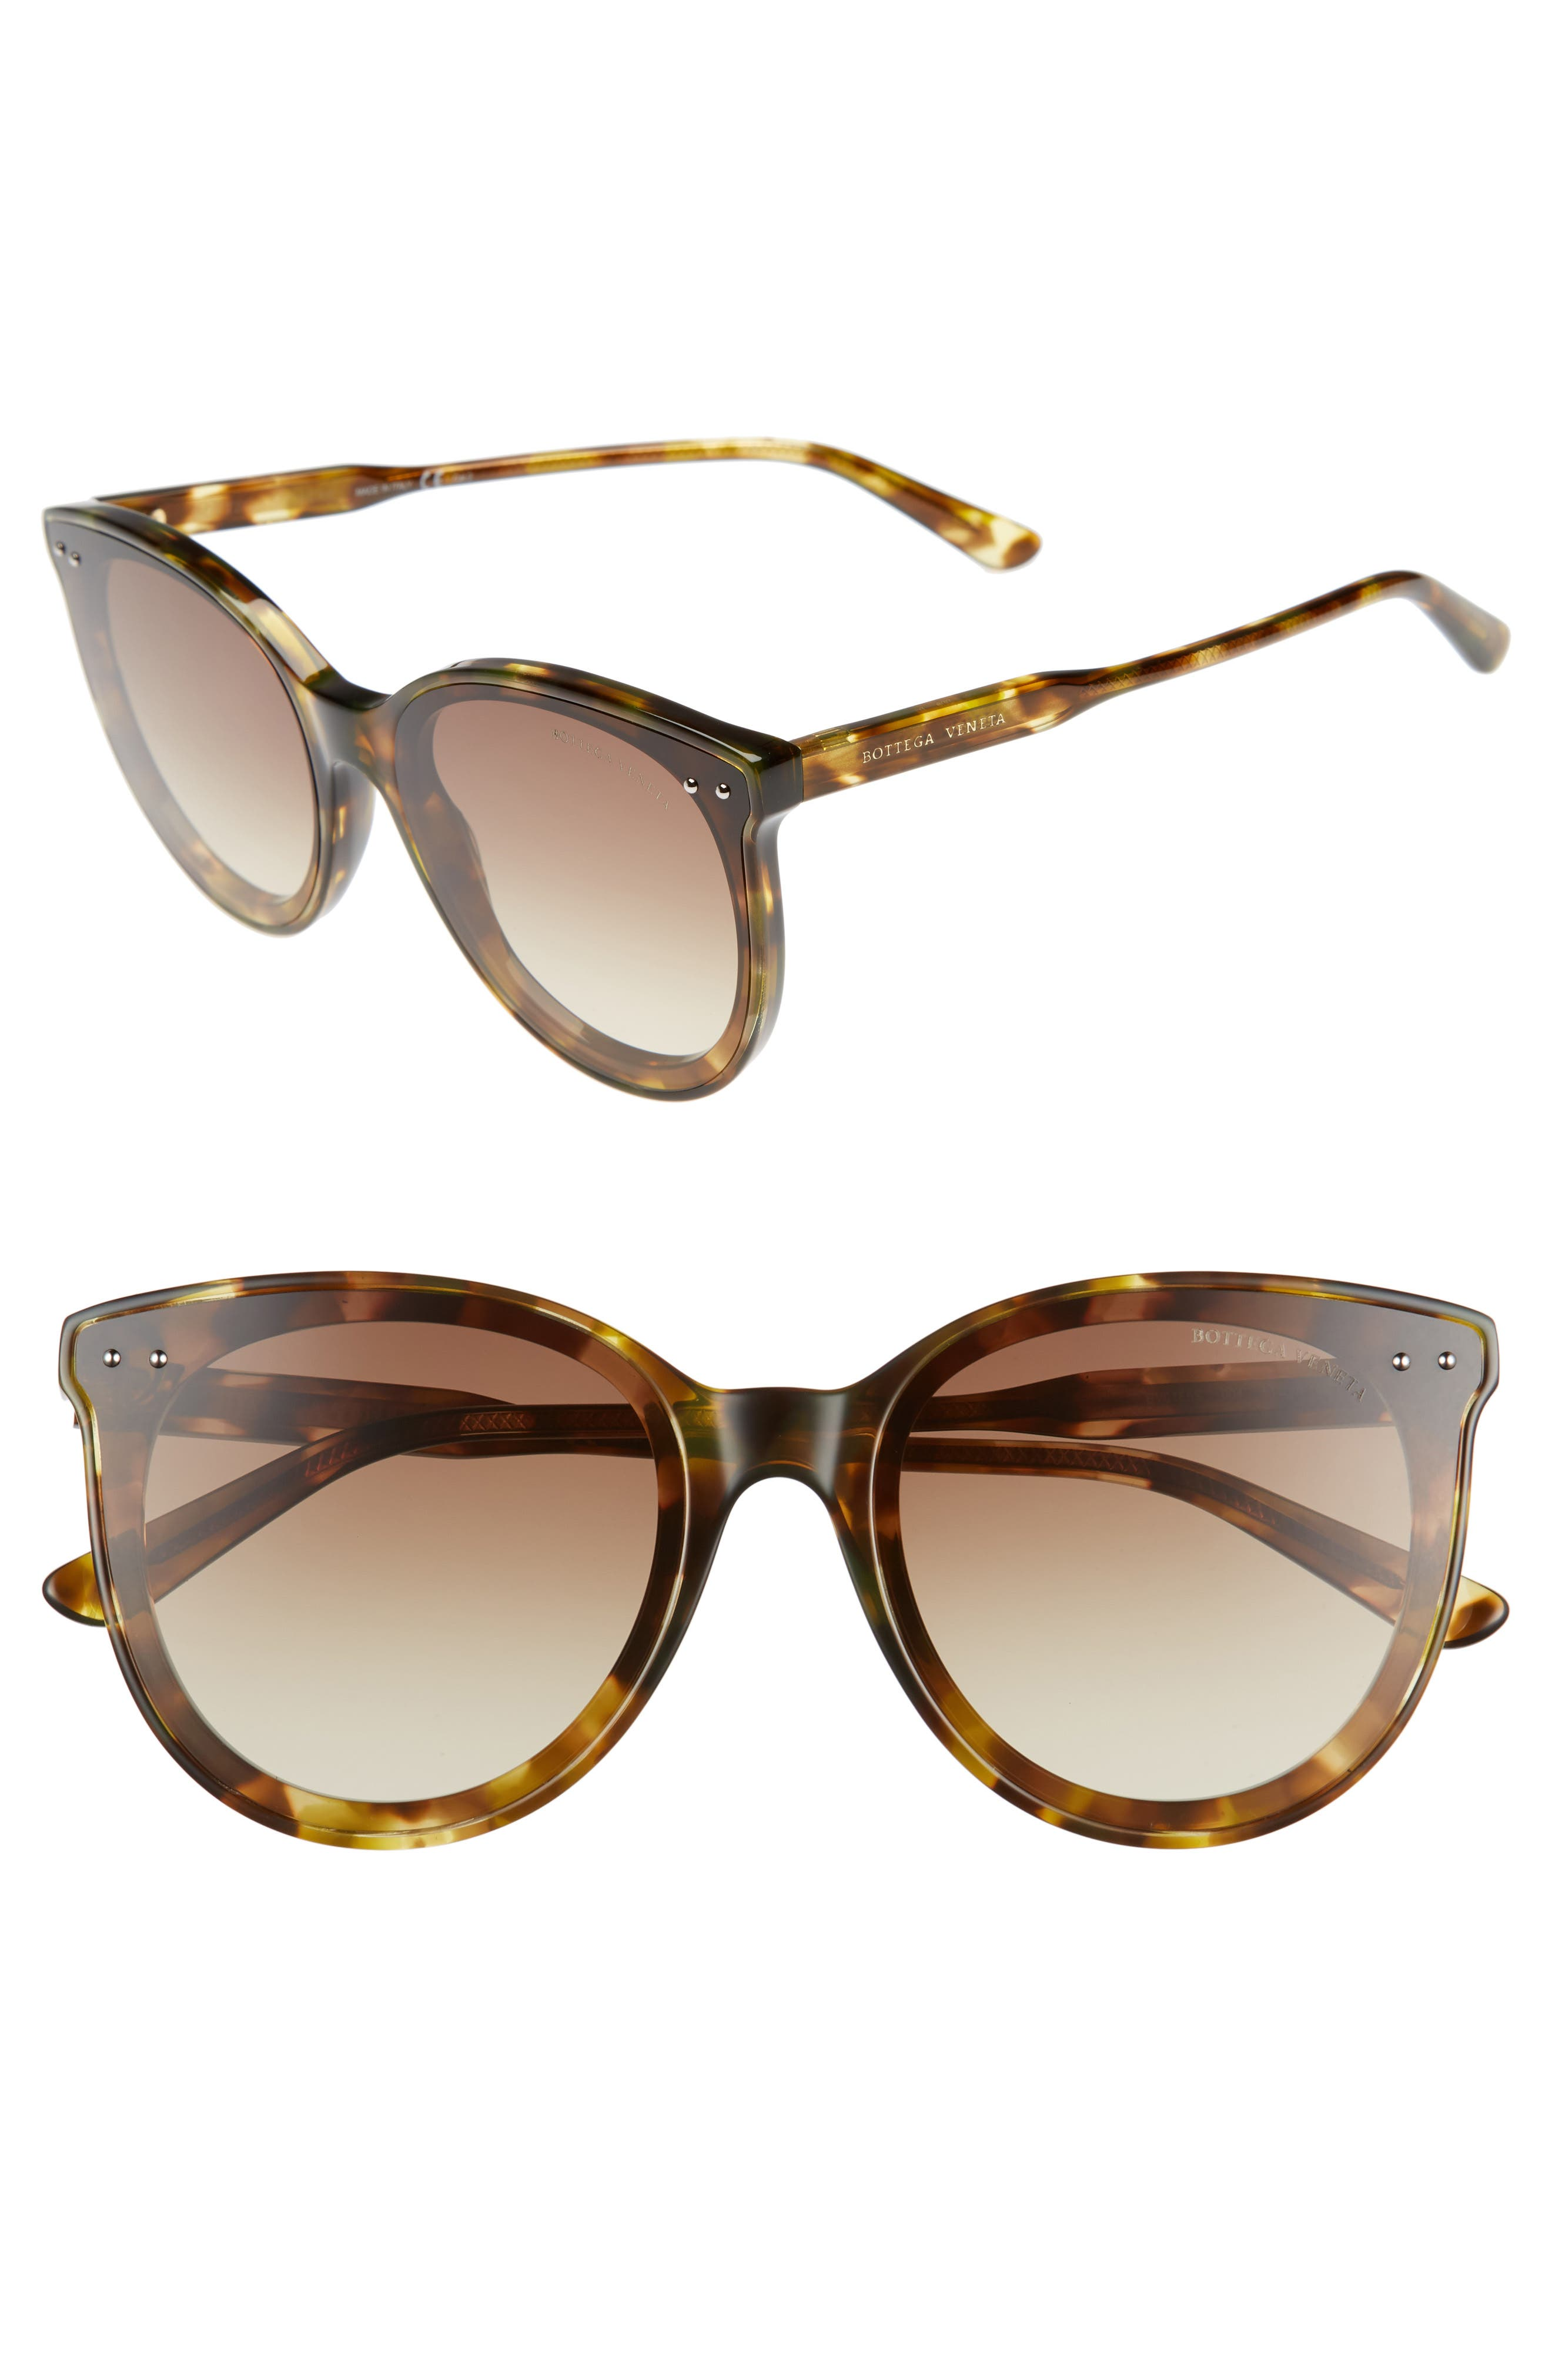 61mm Cat Eye Sunglasses,                         Main,                         color, GREEN HAVANA